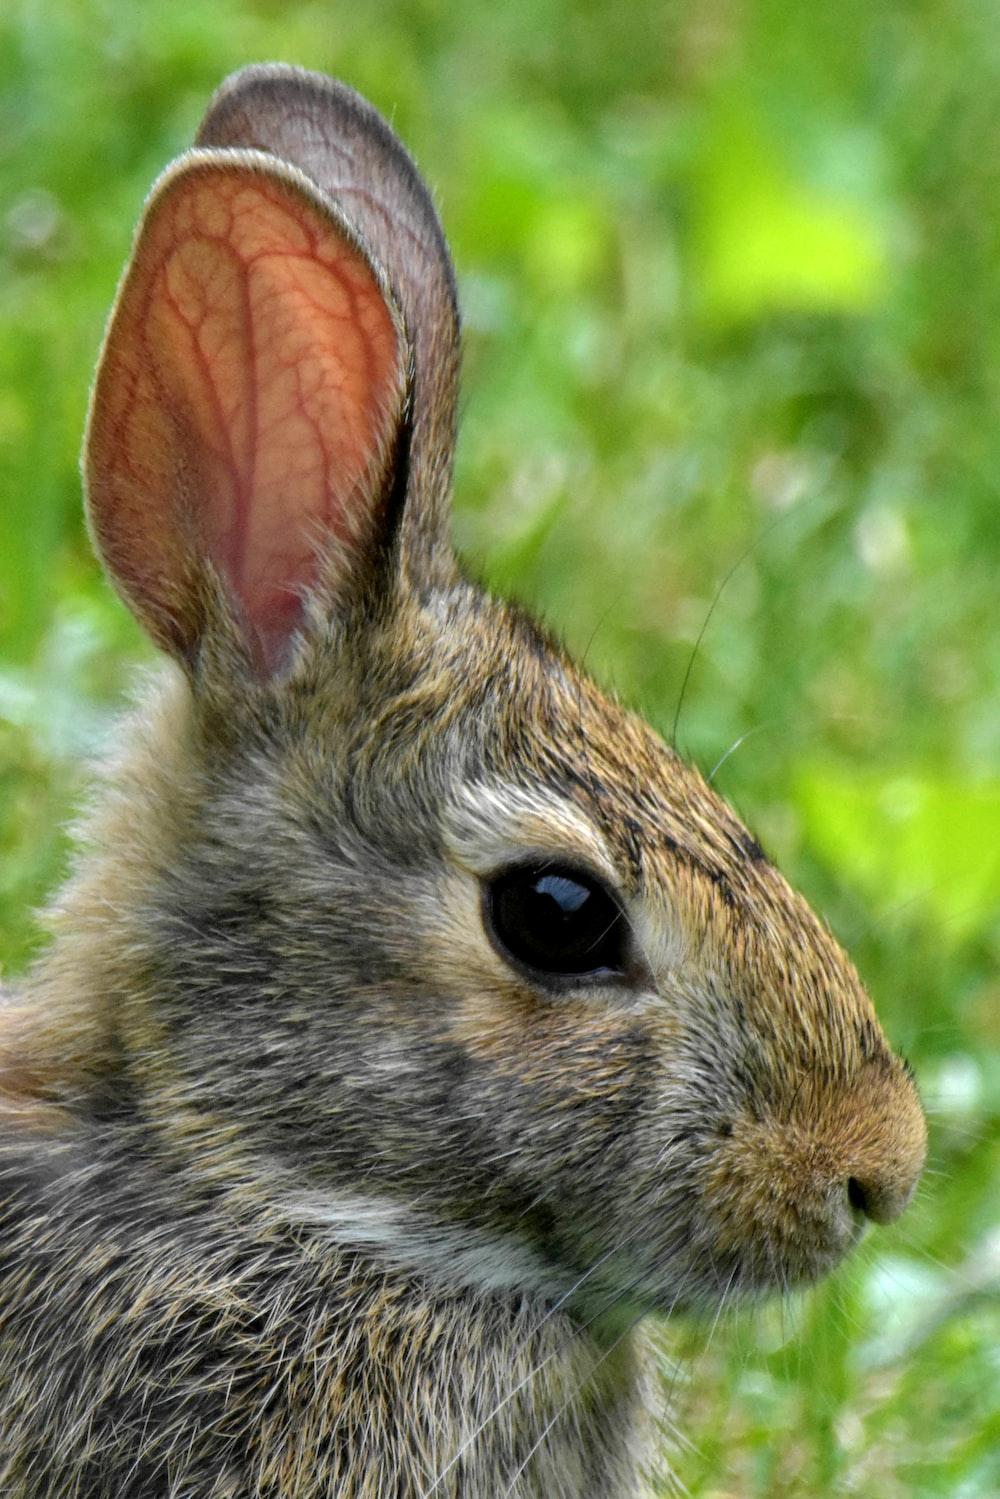 brown rabbit on green grass during daytime